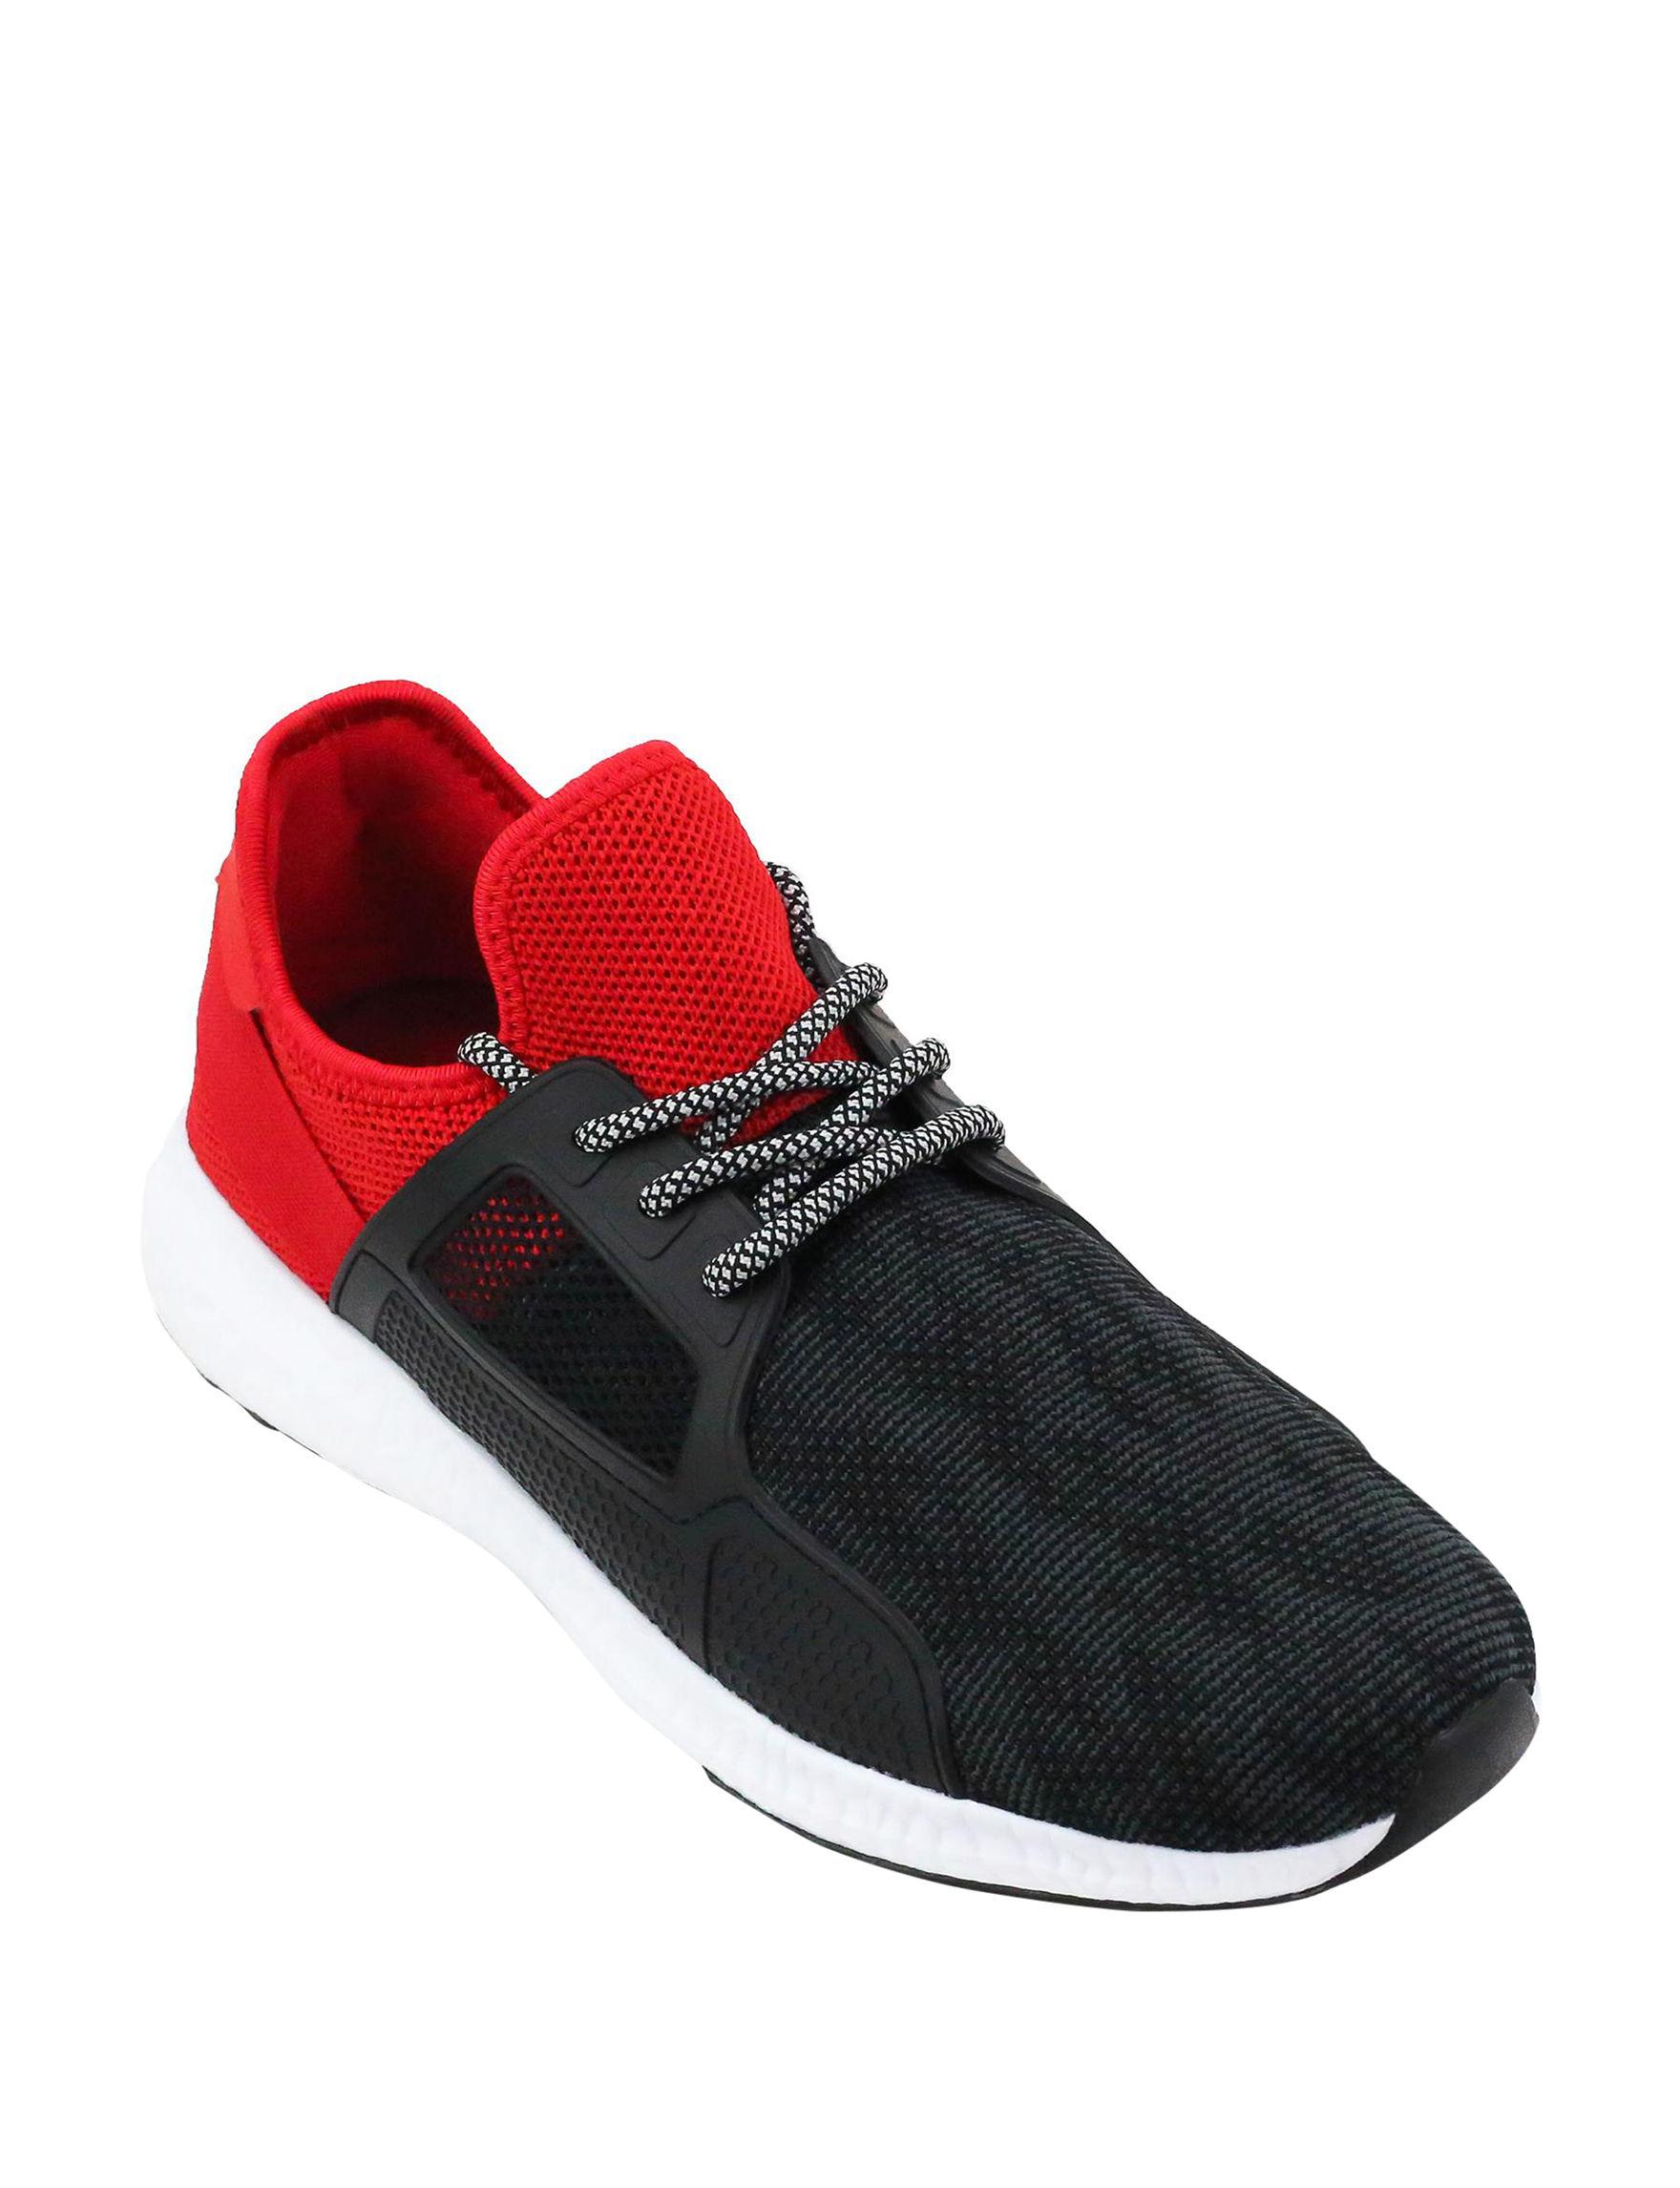 XRay Black / Red